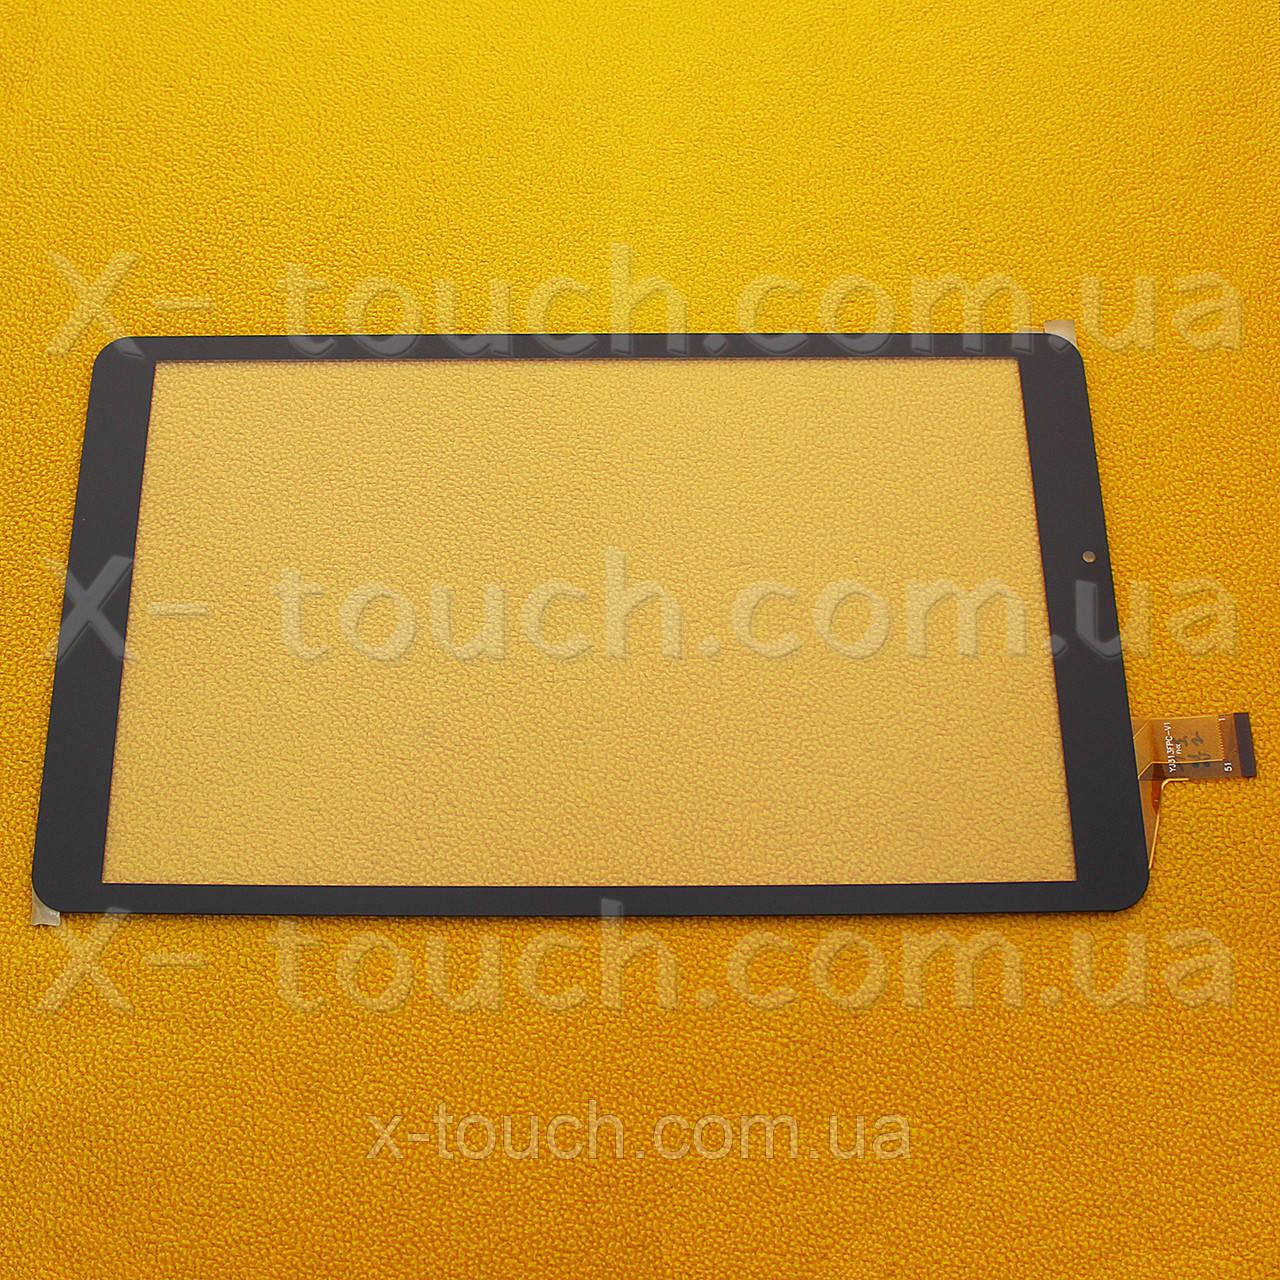 Тачскрин, сенсор HSCTP-787-10.1-V0 для планшета